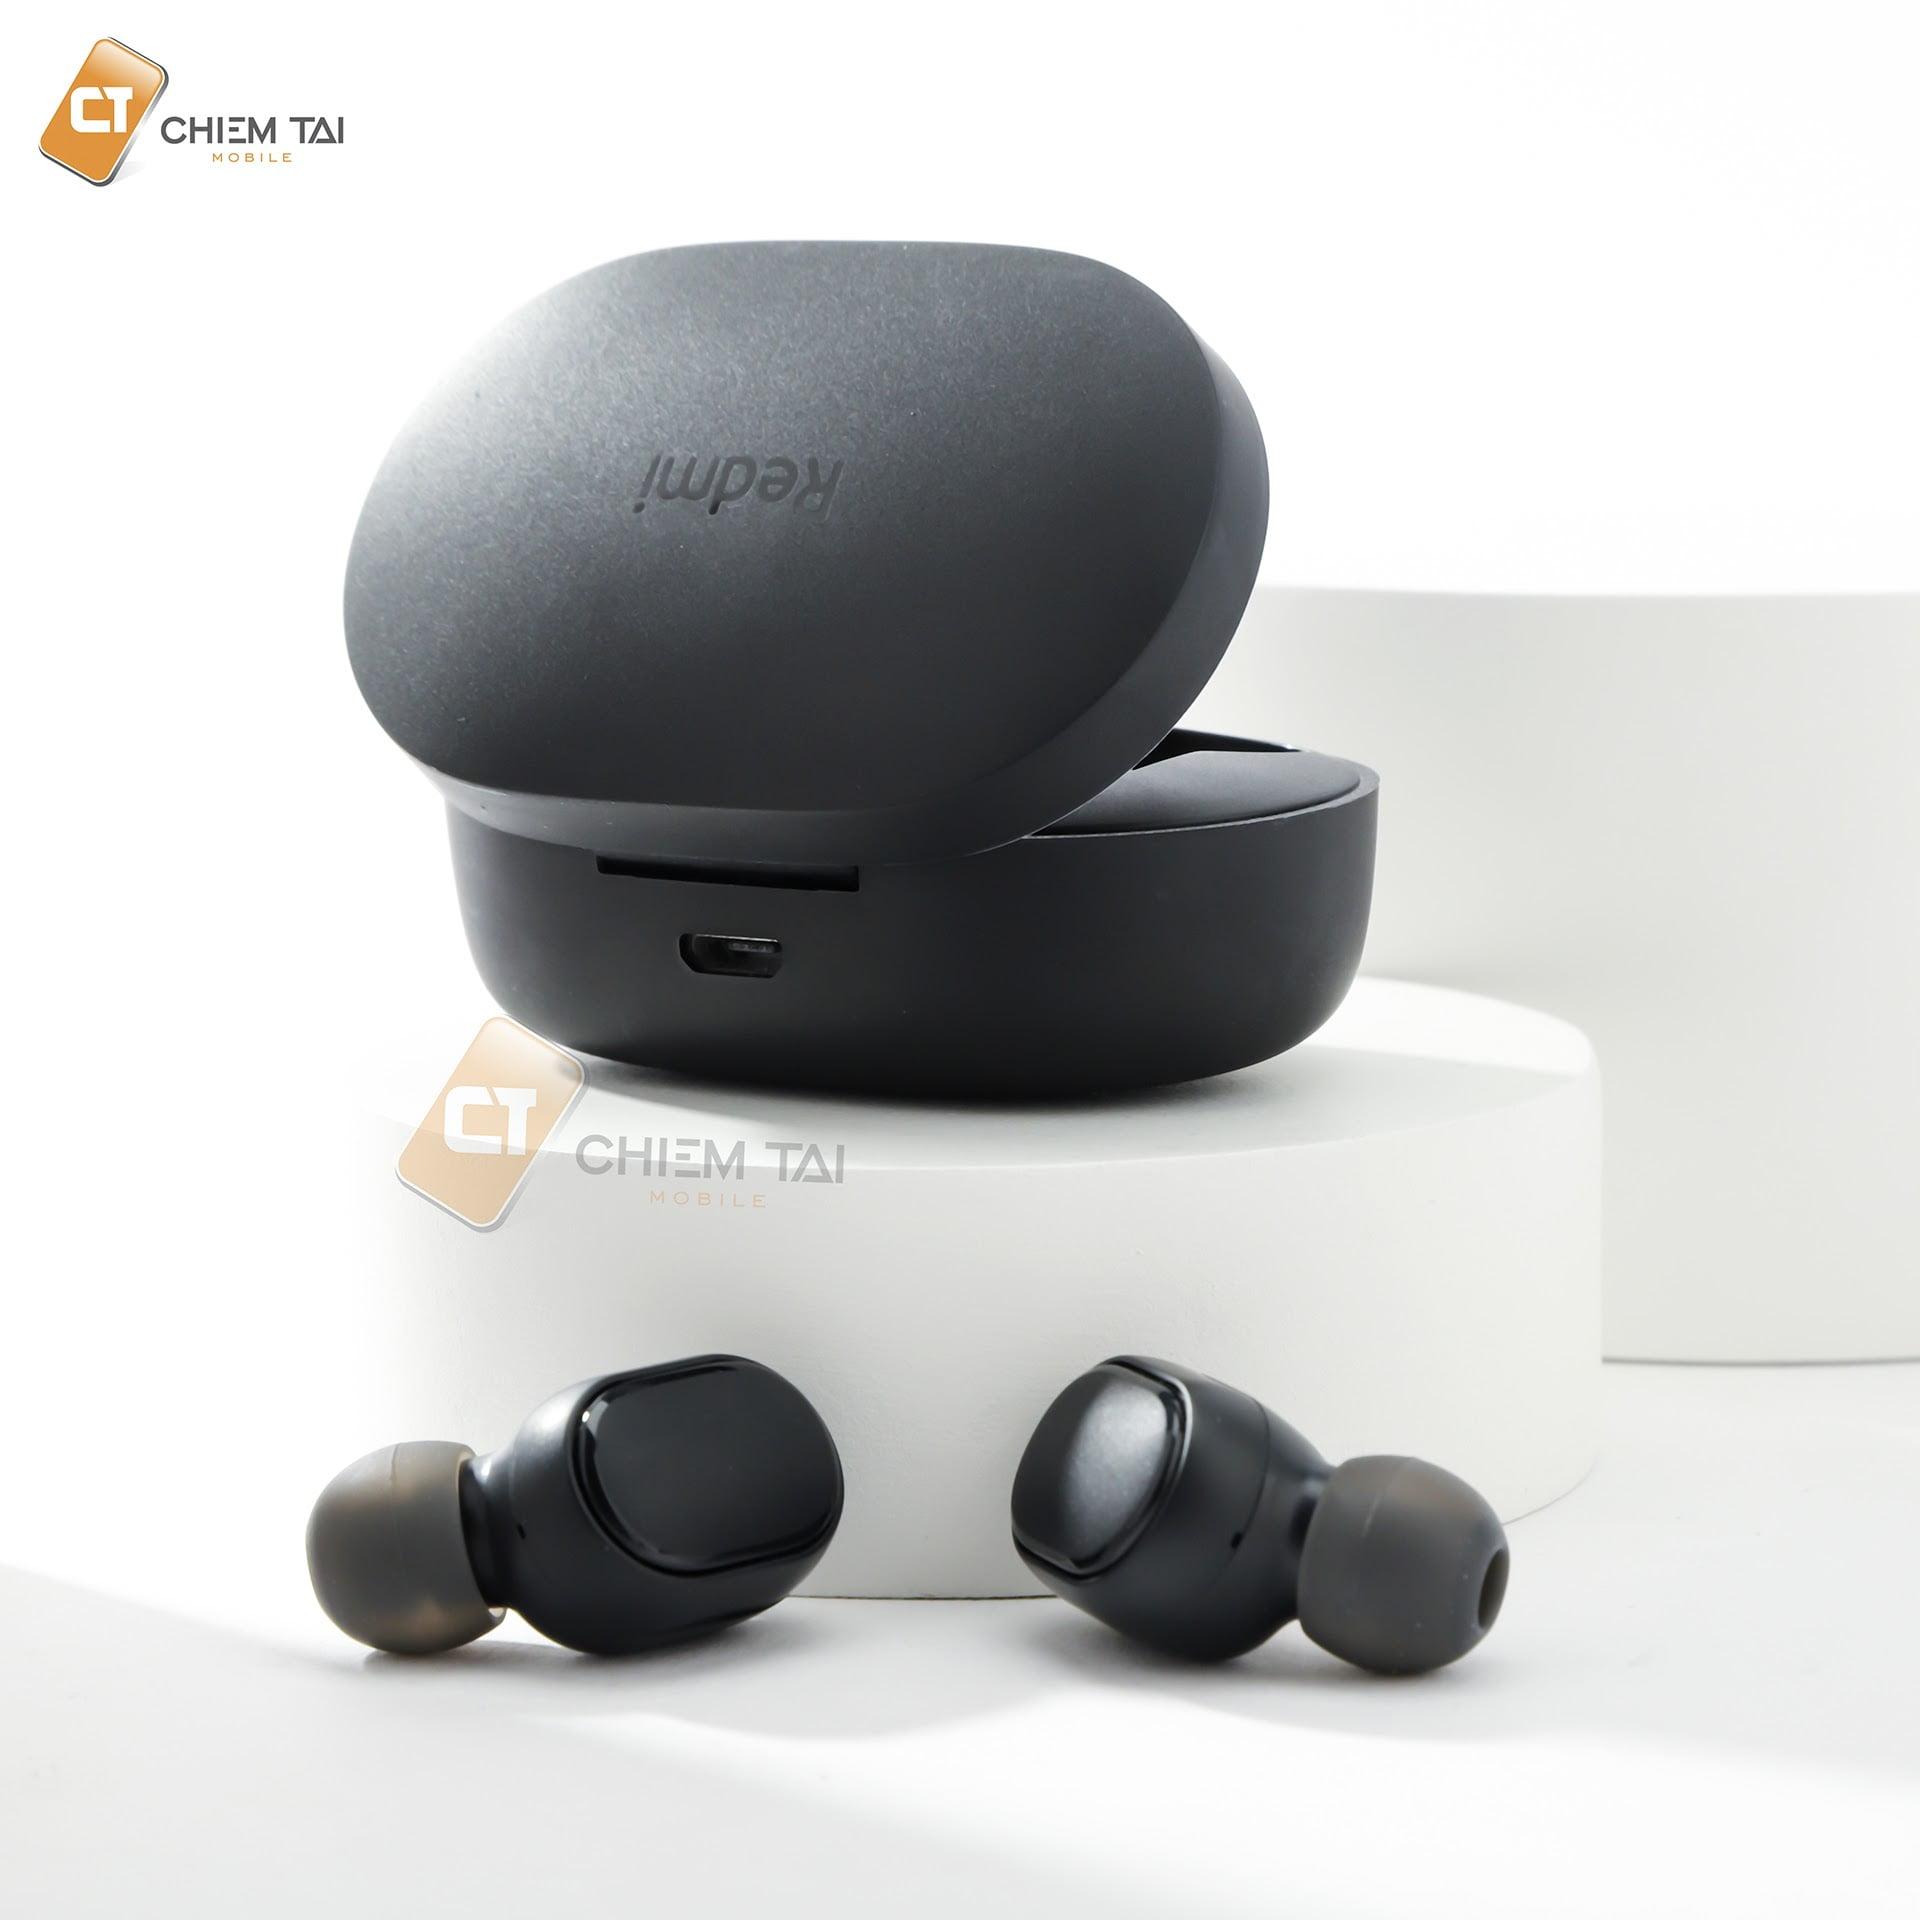 tai nghe bluetooth true wireless redmi airdots 2 605063caf2a28